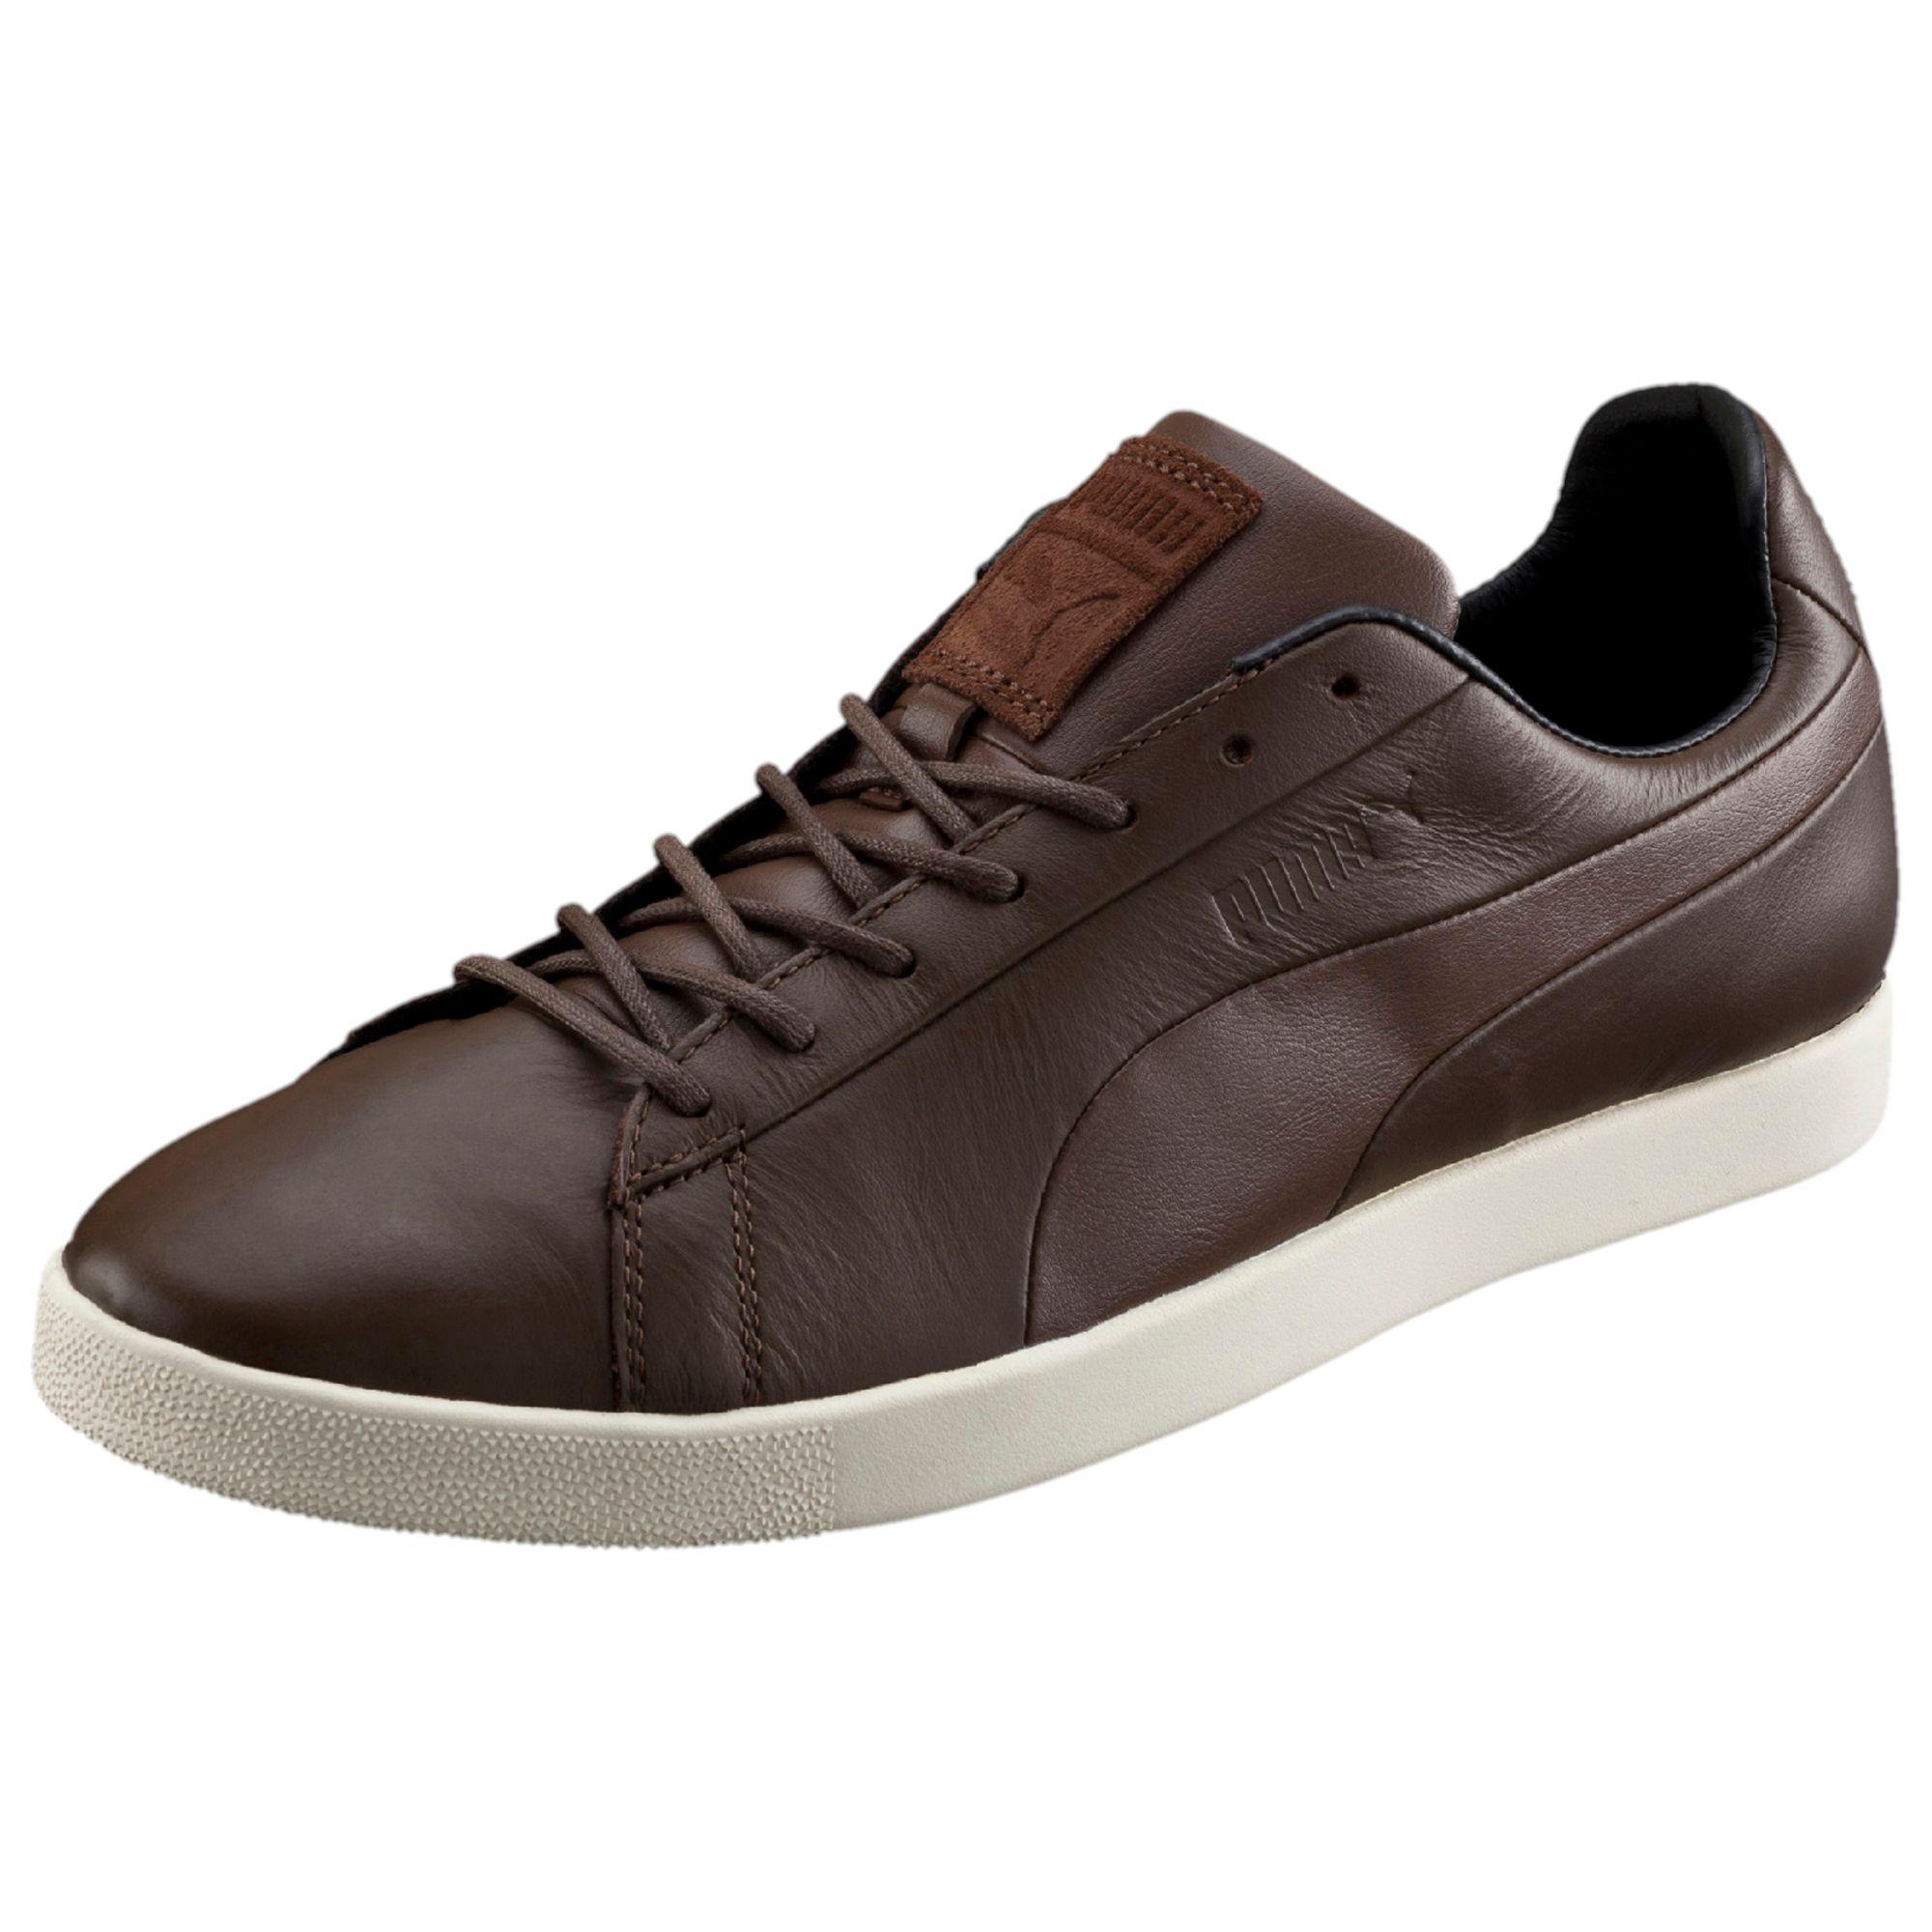 puma modern court citi series sneaker schuhe sneakers evolution unisex neu ebay. Black Bedroom Furniture Sets. Home Design Ideas